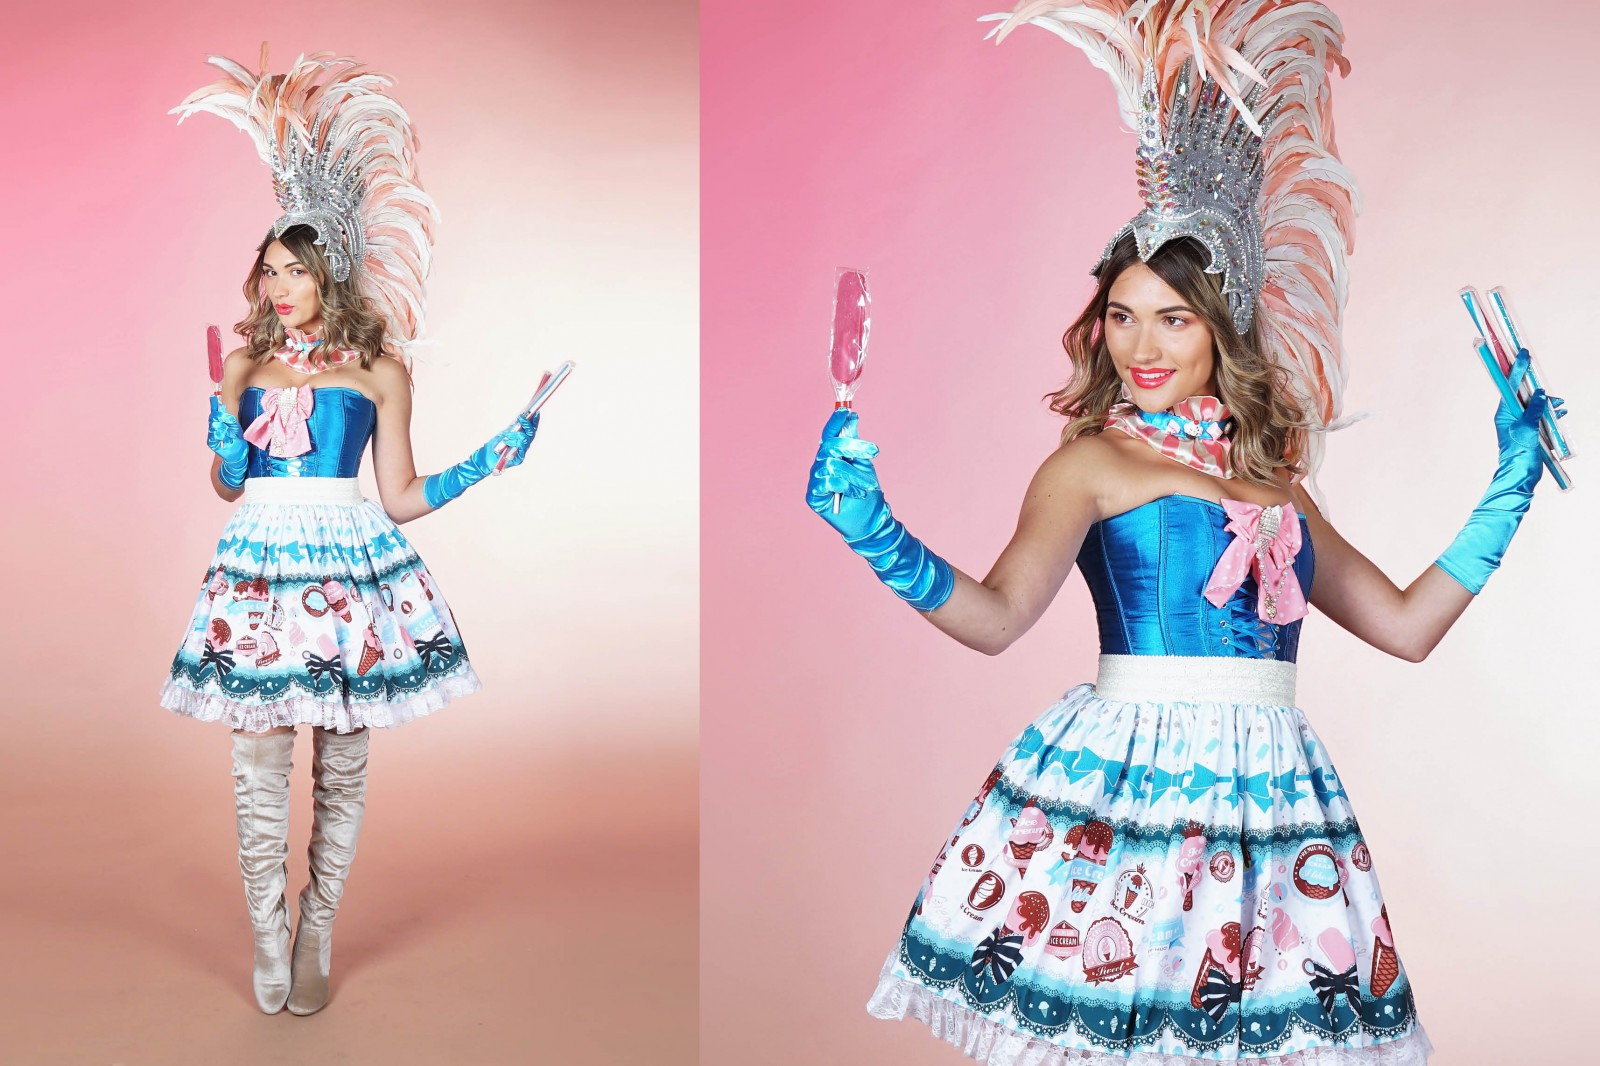 cany girl, roze candy, roze snoepdame, thema evenement, thema feest,